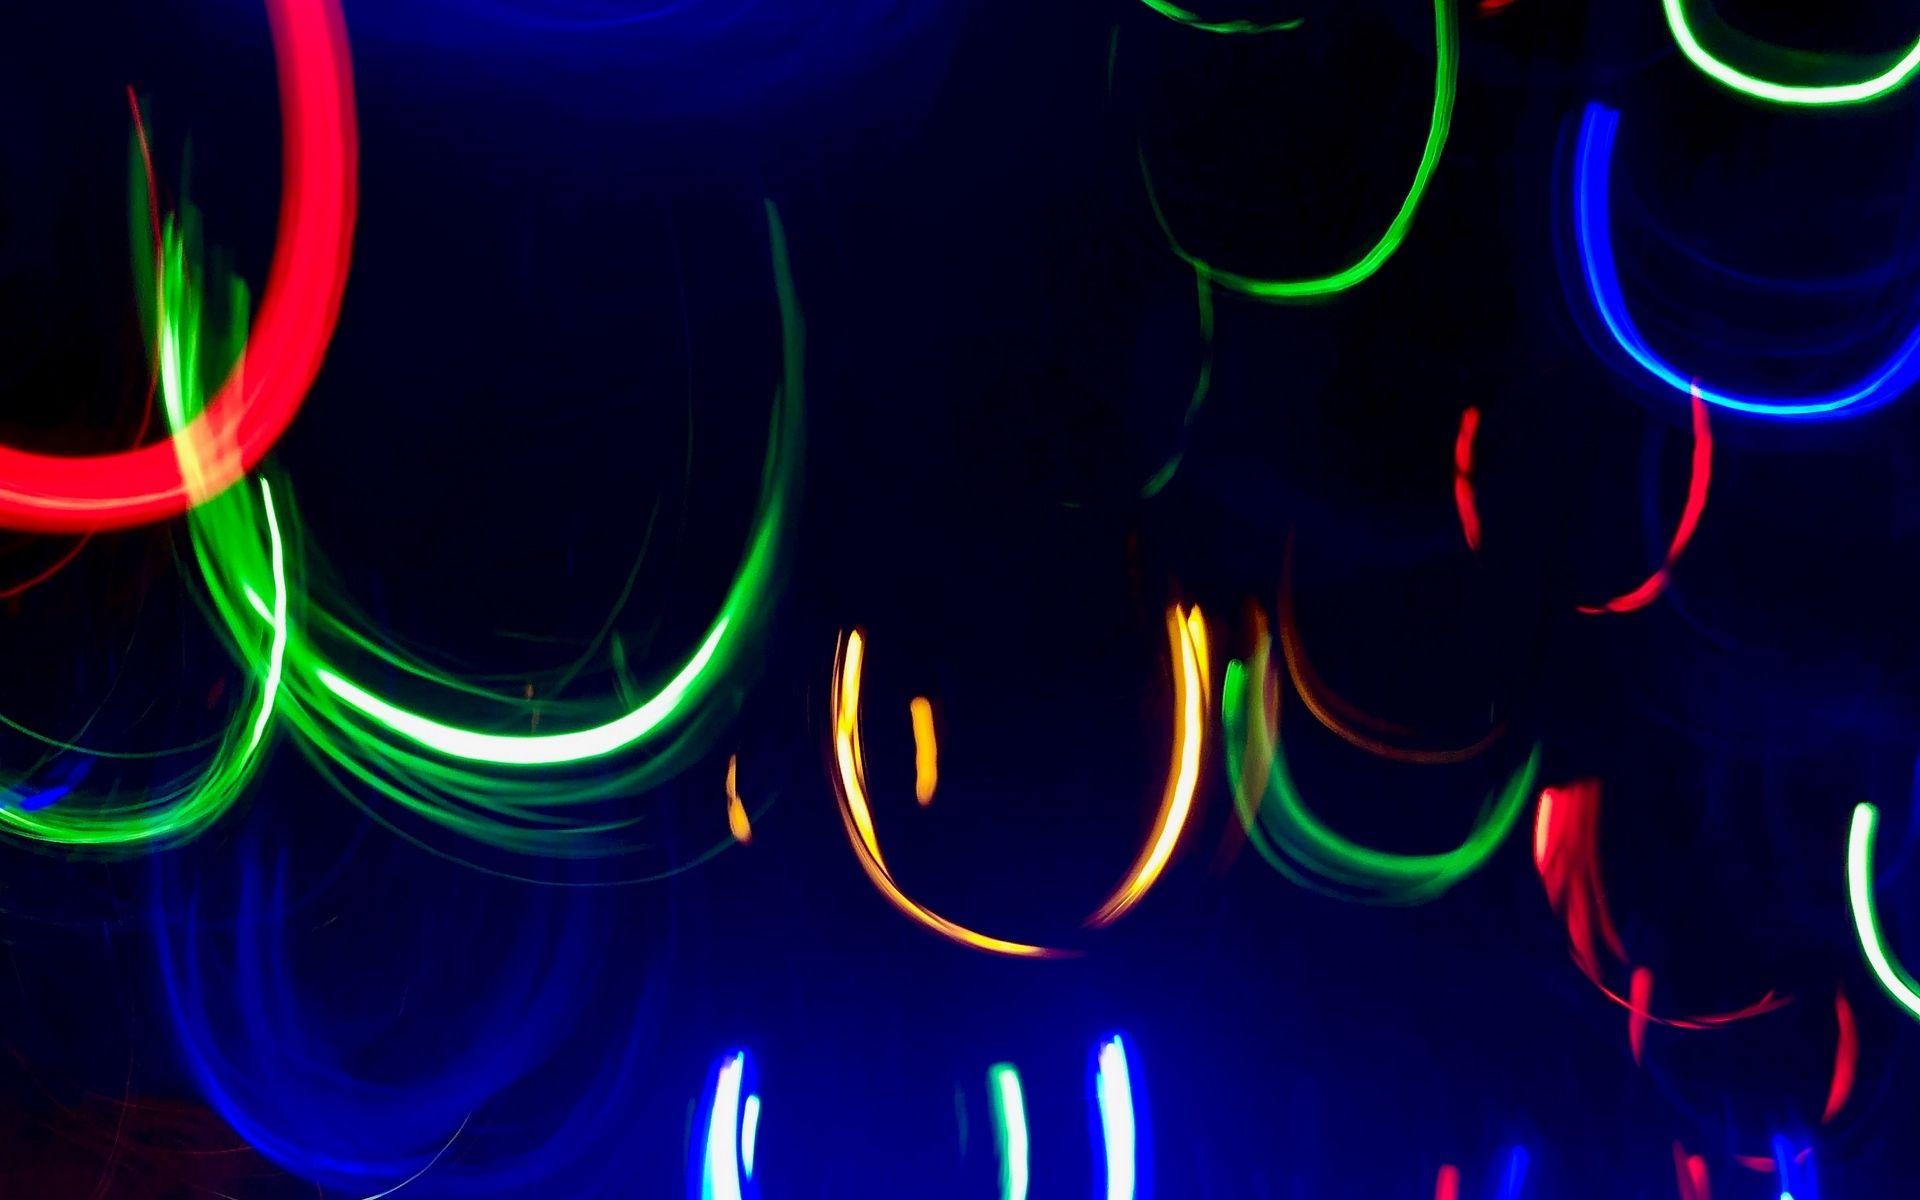 Neon Color Code Wallpaper Hd Code Wallpaper Neon Color Hd Wallpaper